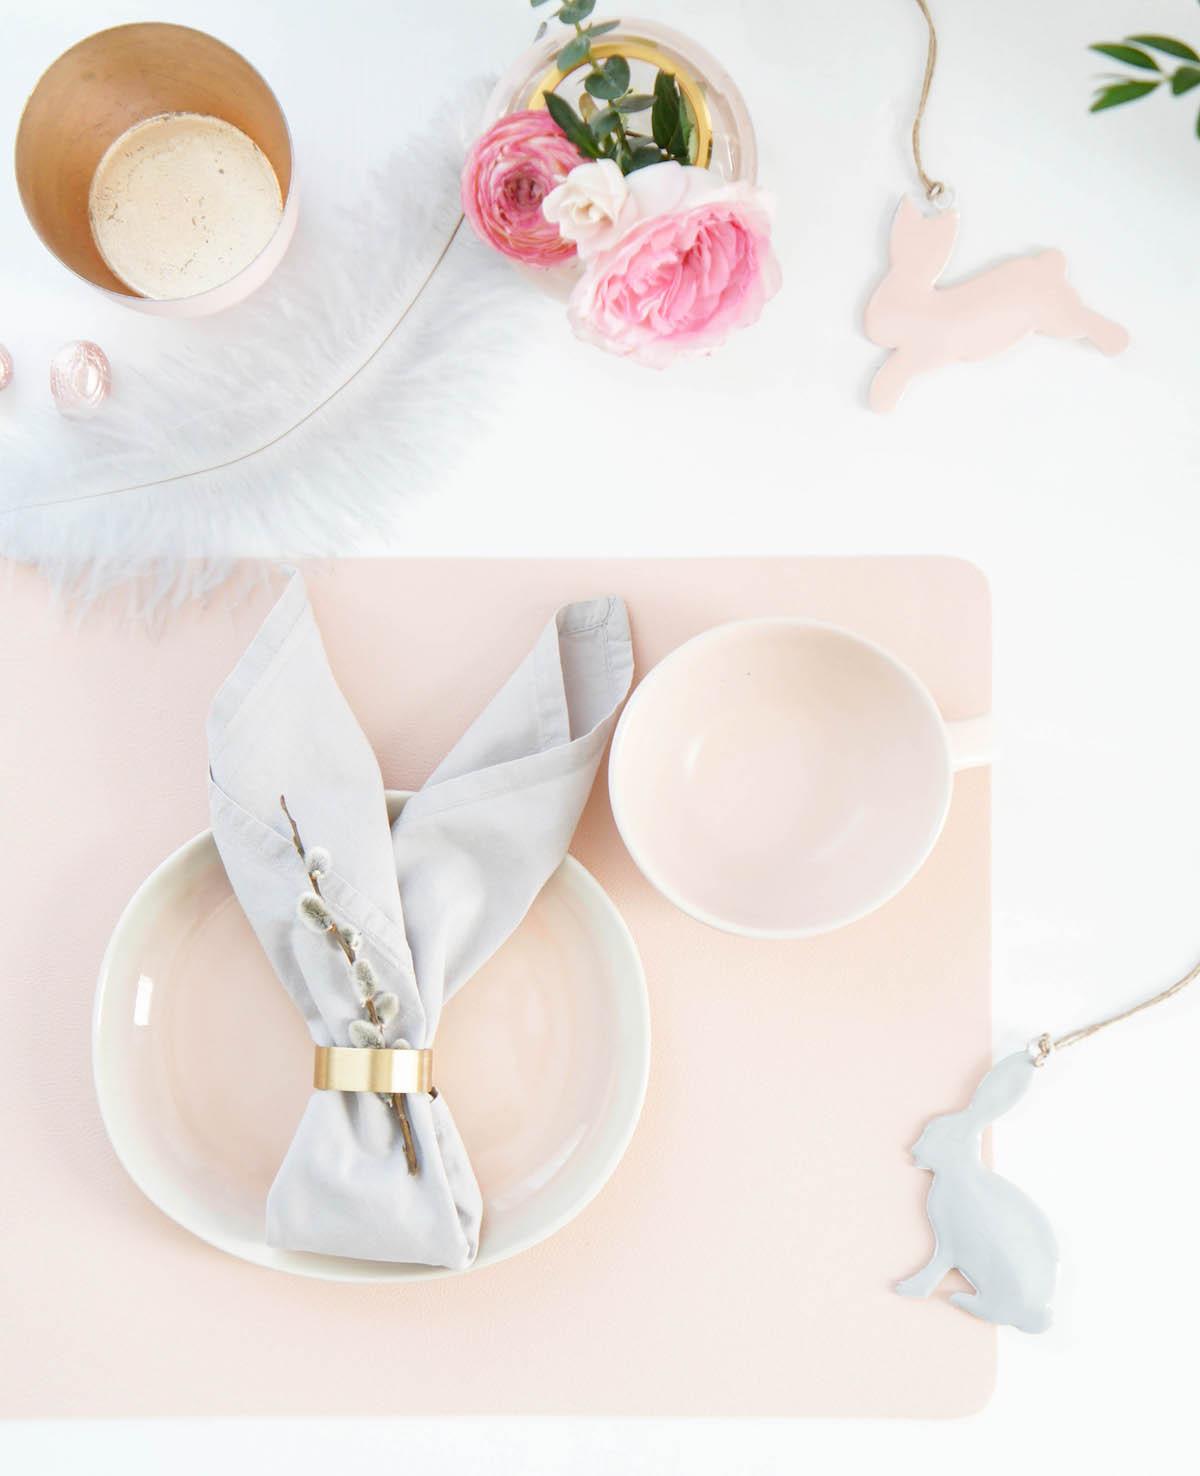 Tischdeko Ideen Fur Ostern Osterdeko Online Kaufen Heimkleid